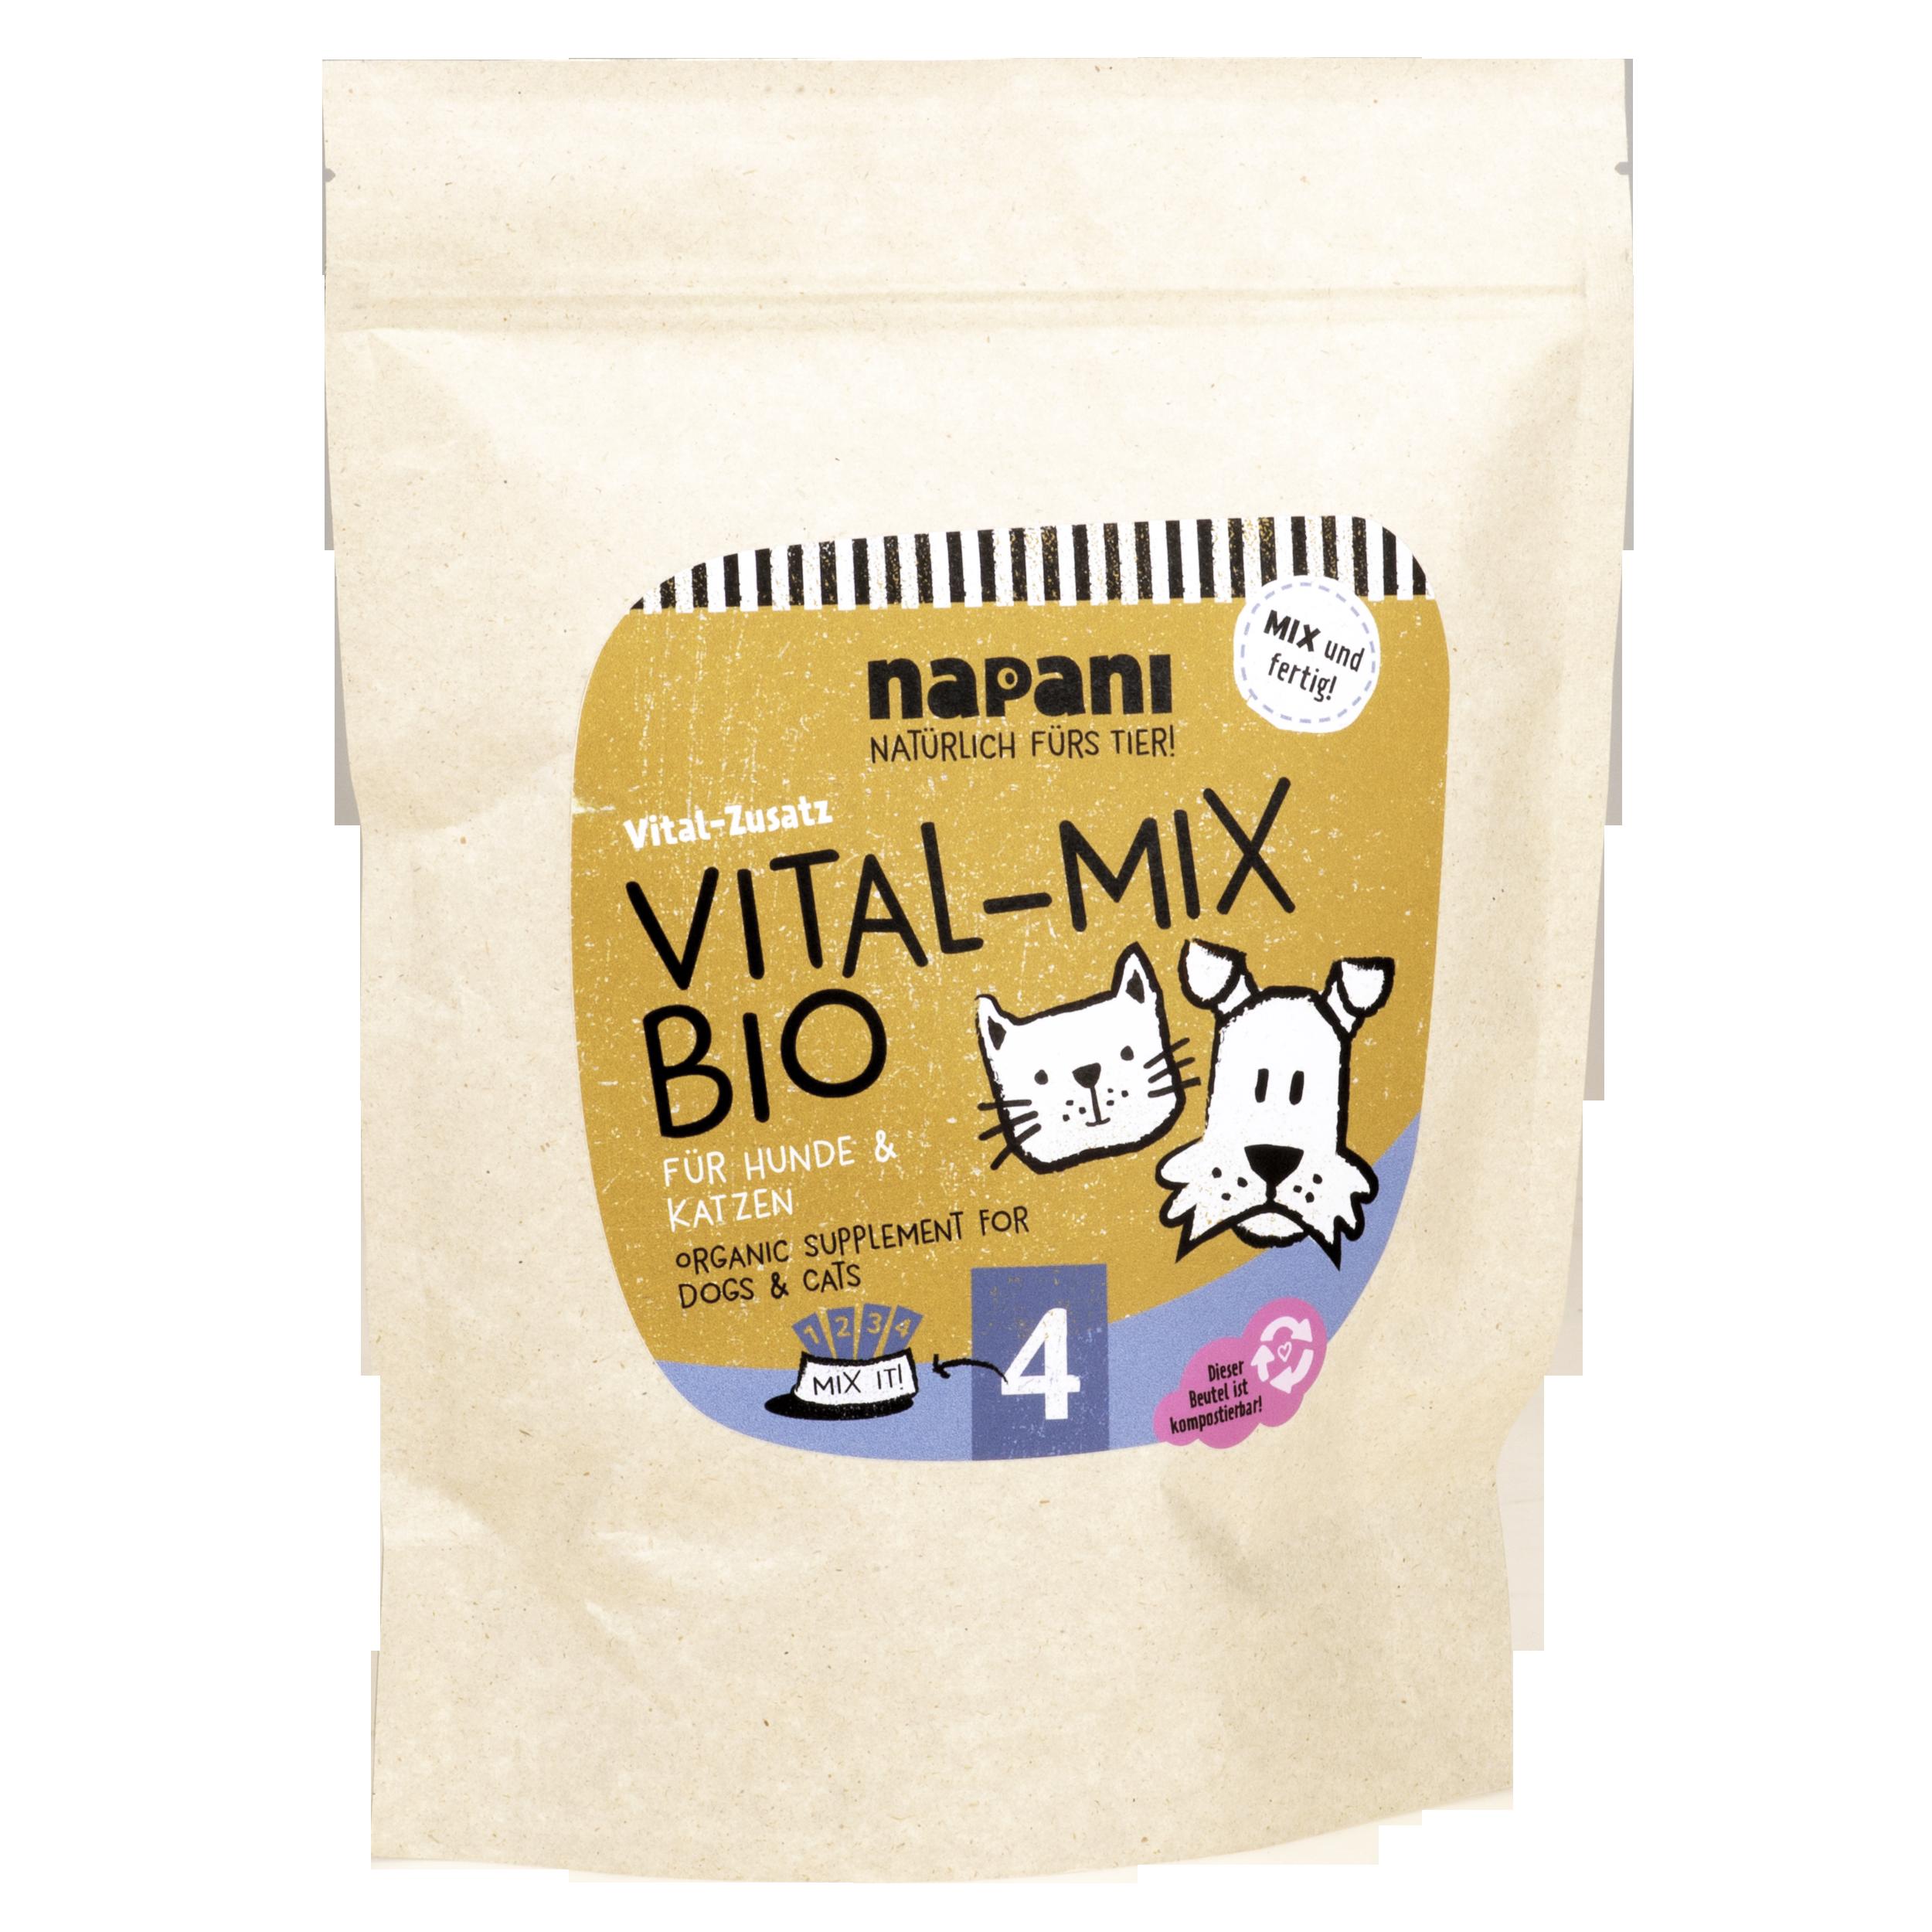 Napani Vitalmix bio, 350g